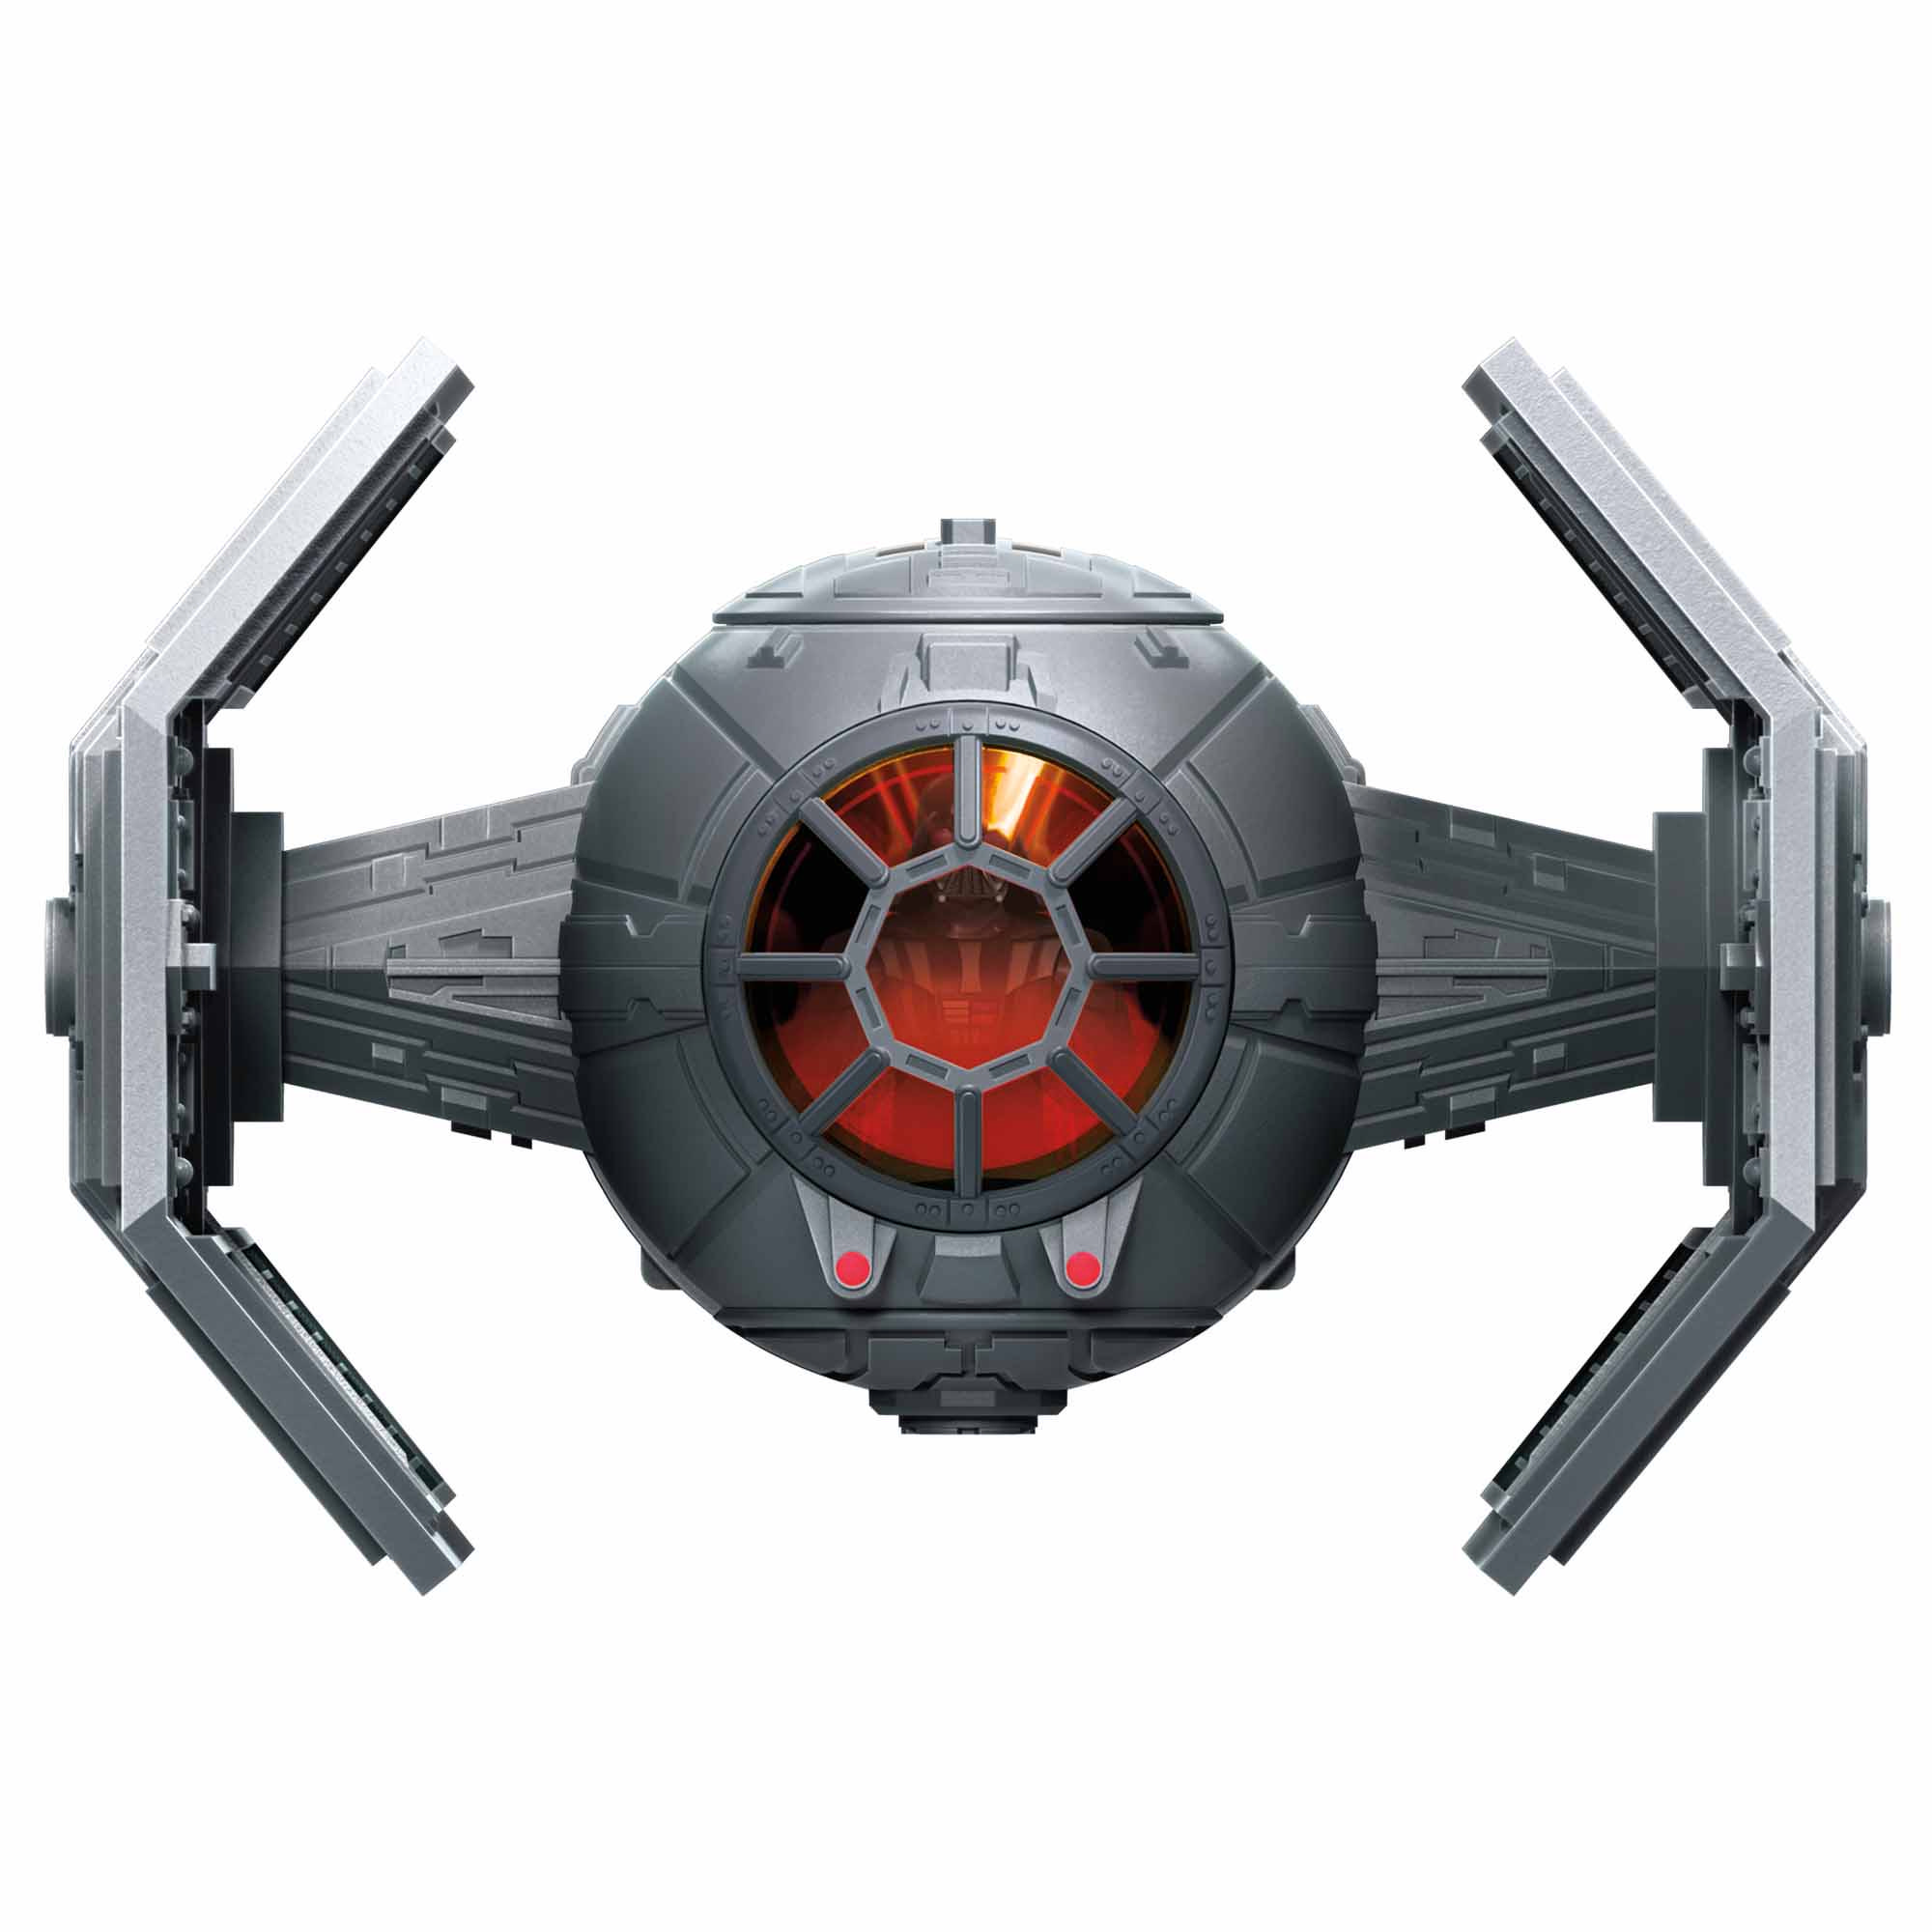 Star Wars Mission Fleet Darth Vader TIE Advanced